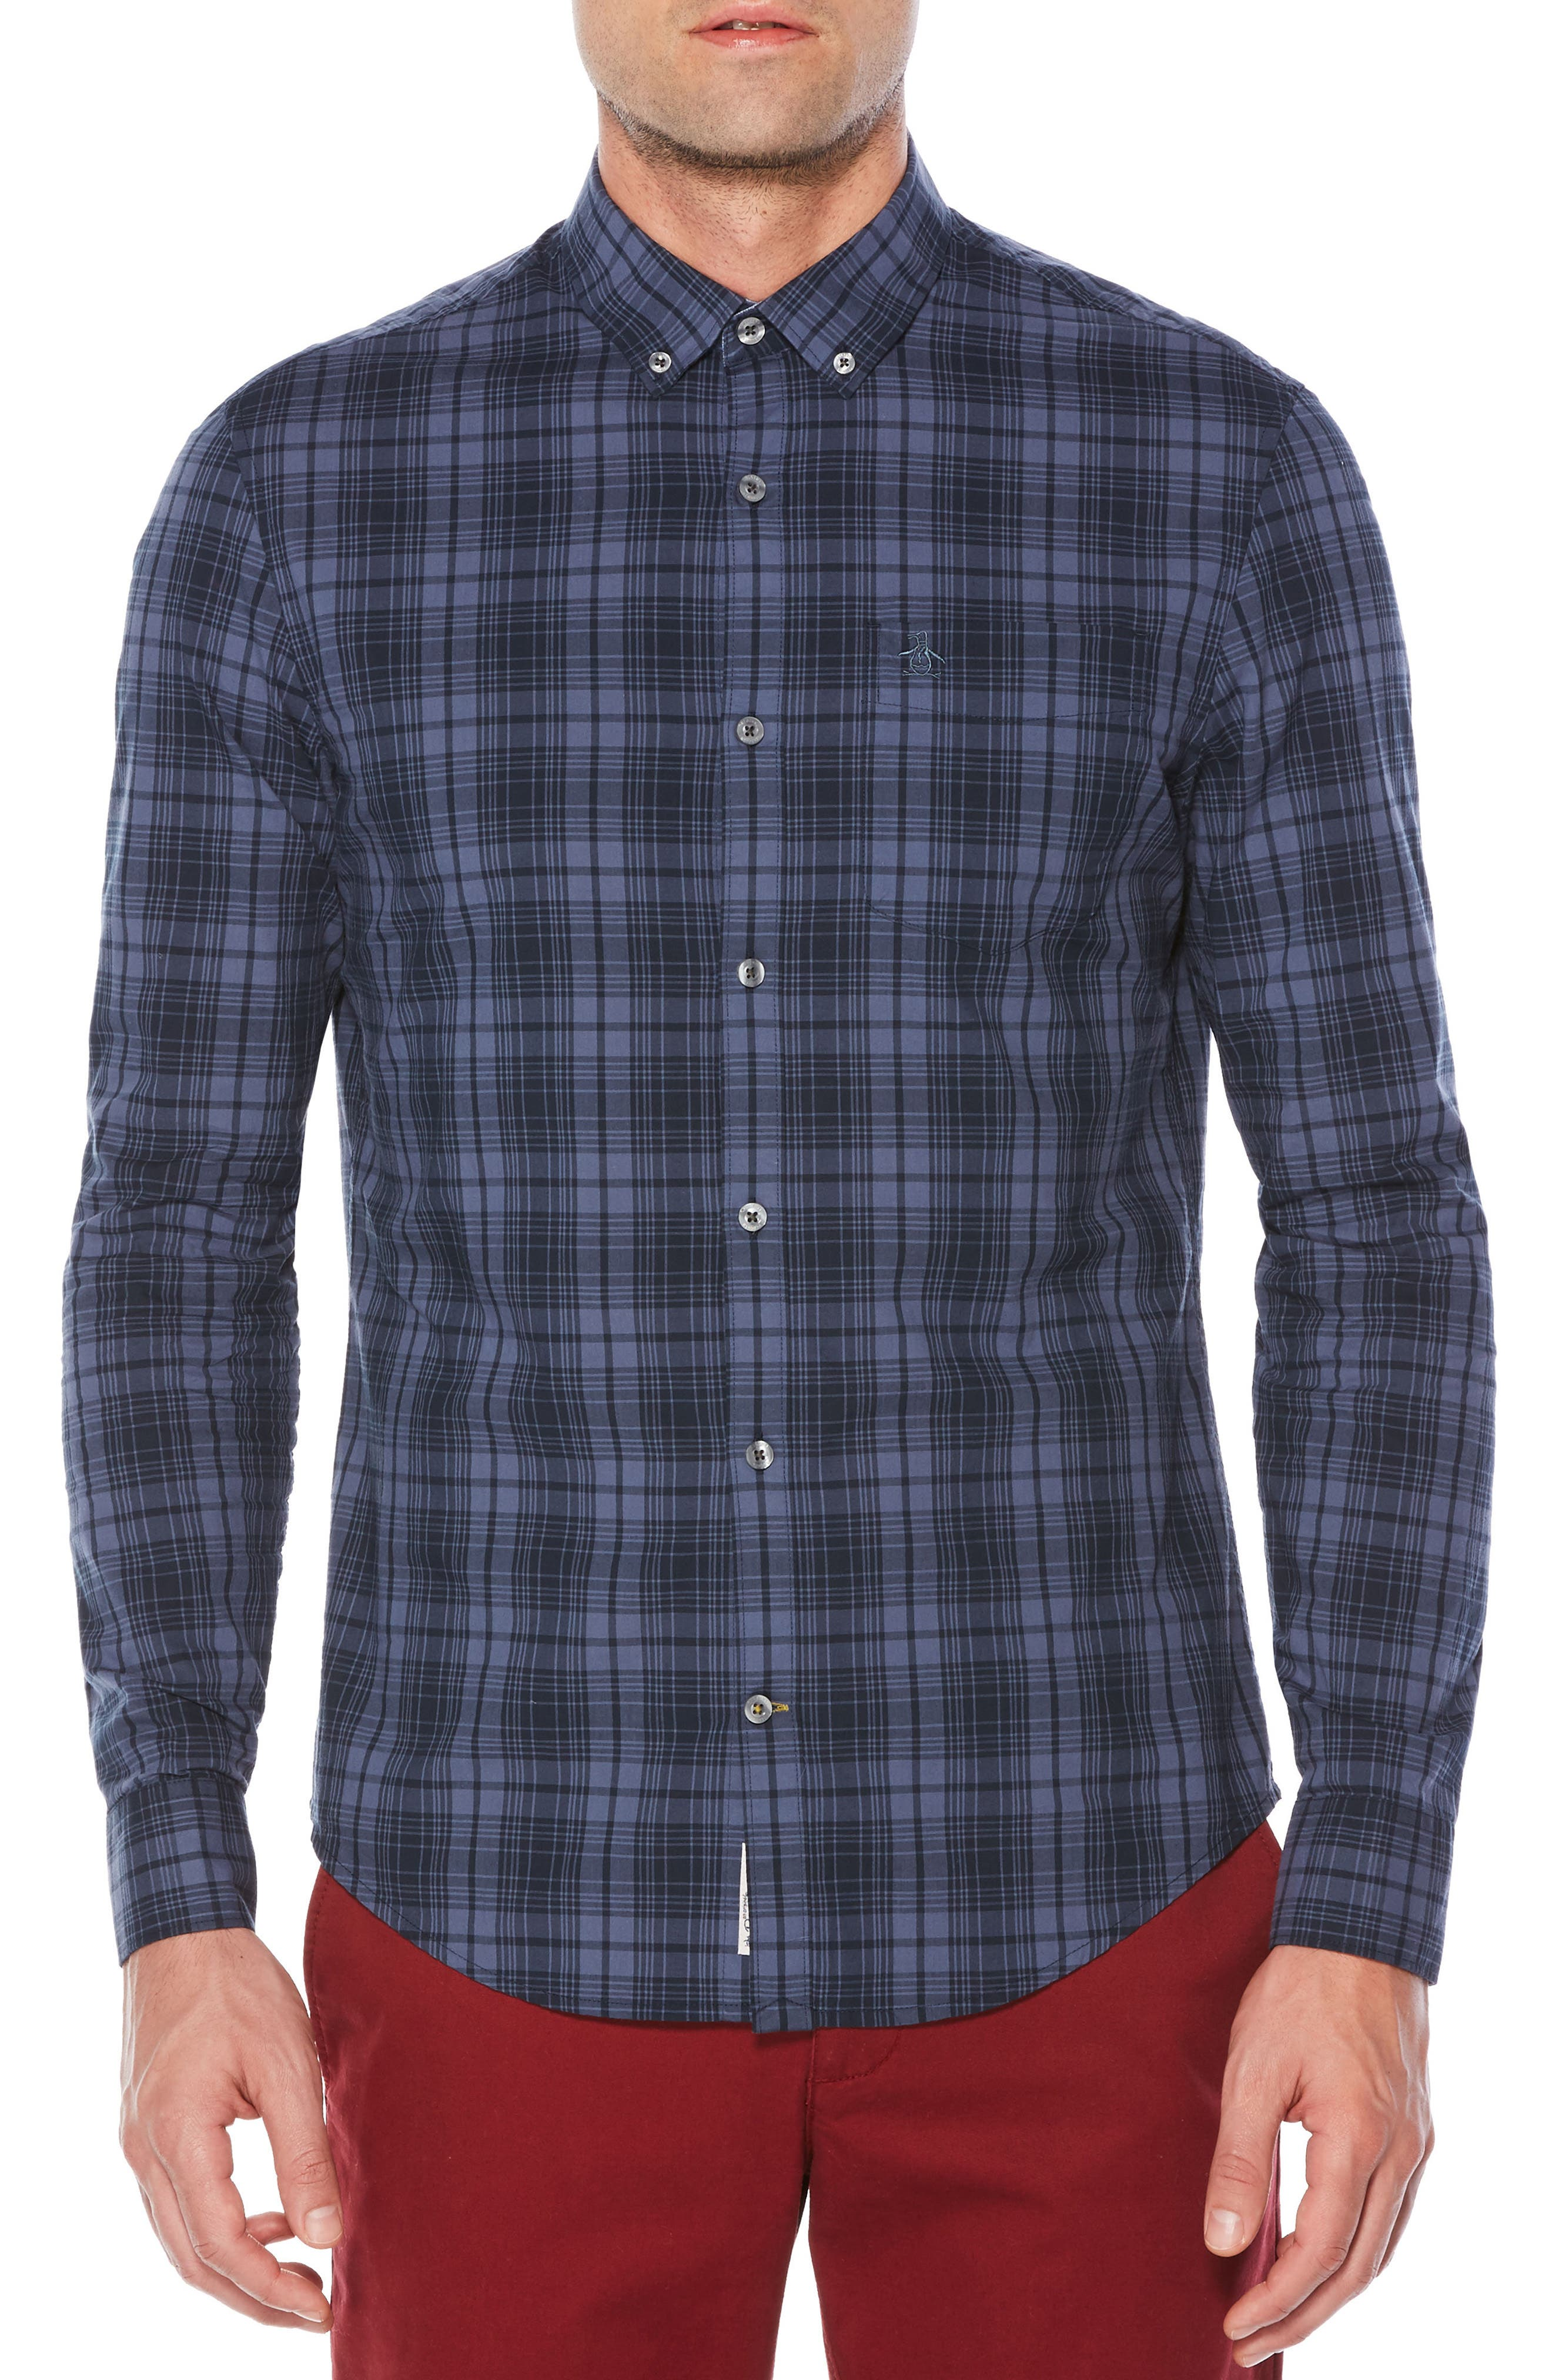 Heritage Slim Fit Plaid Shirt,                         Main,                         color, Vintage Indigo